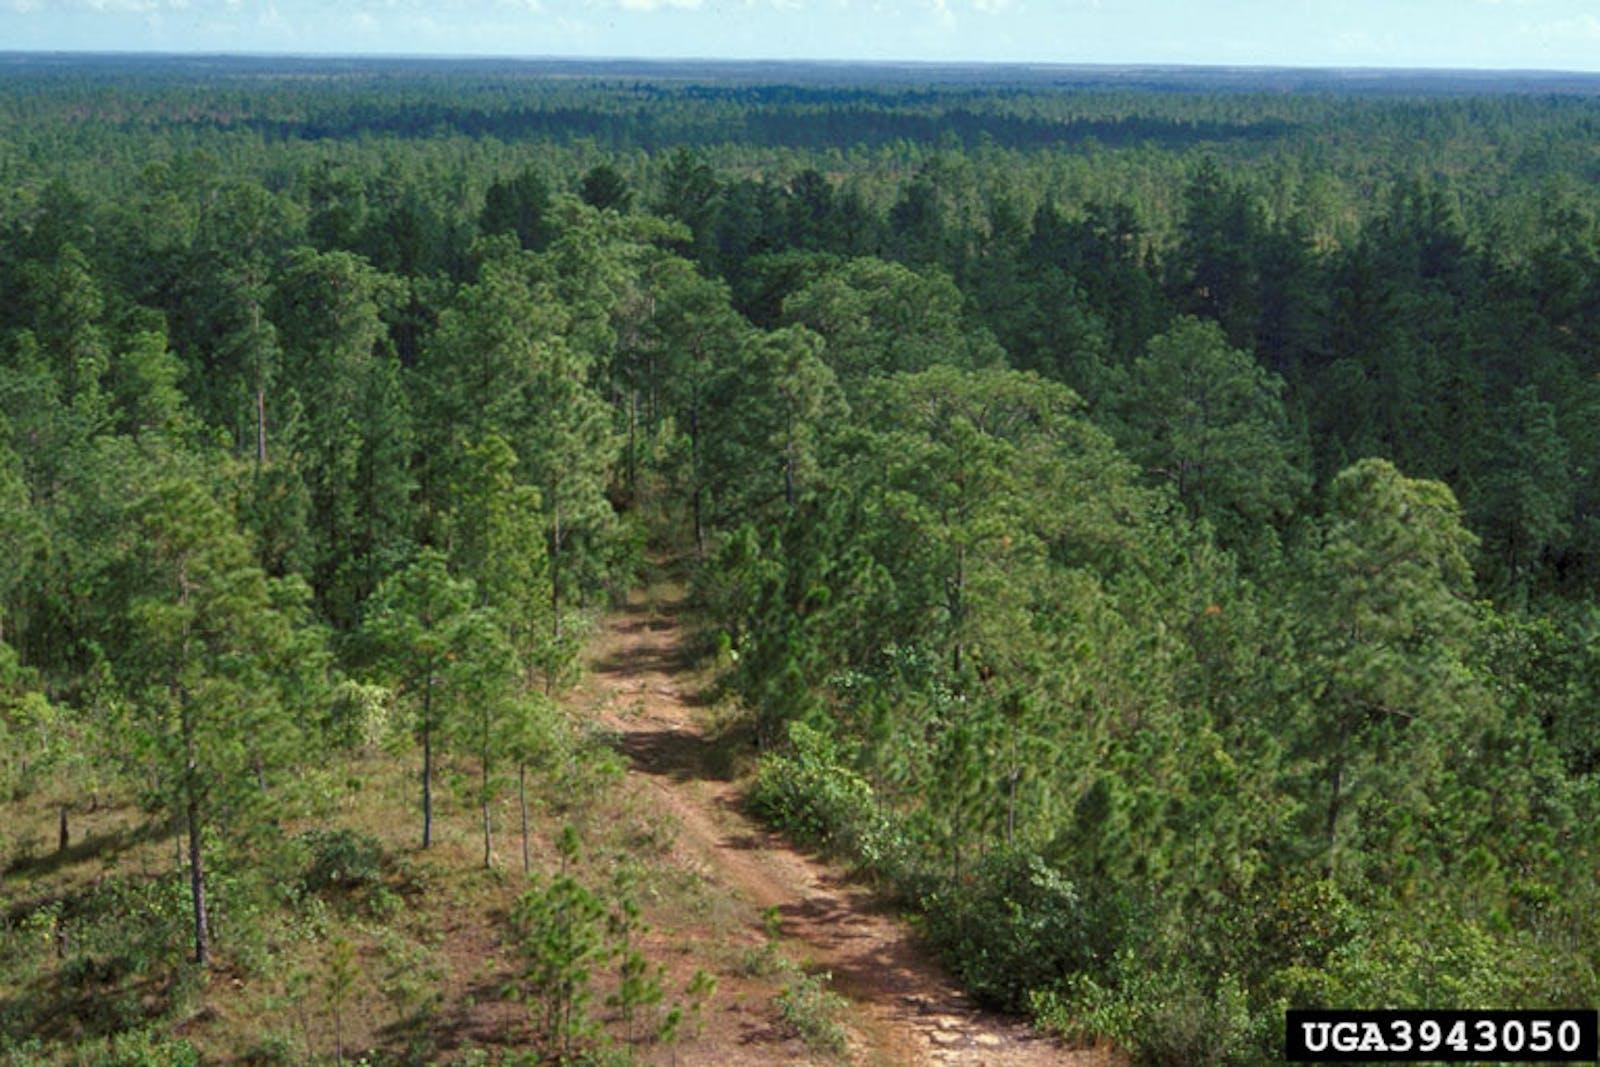 Miskito Pine Forests